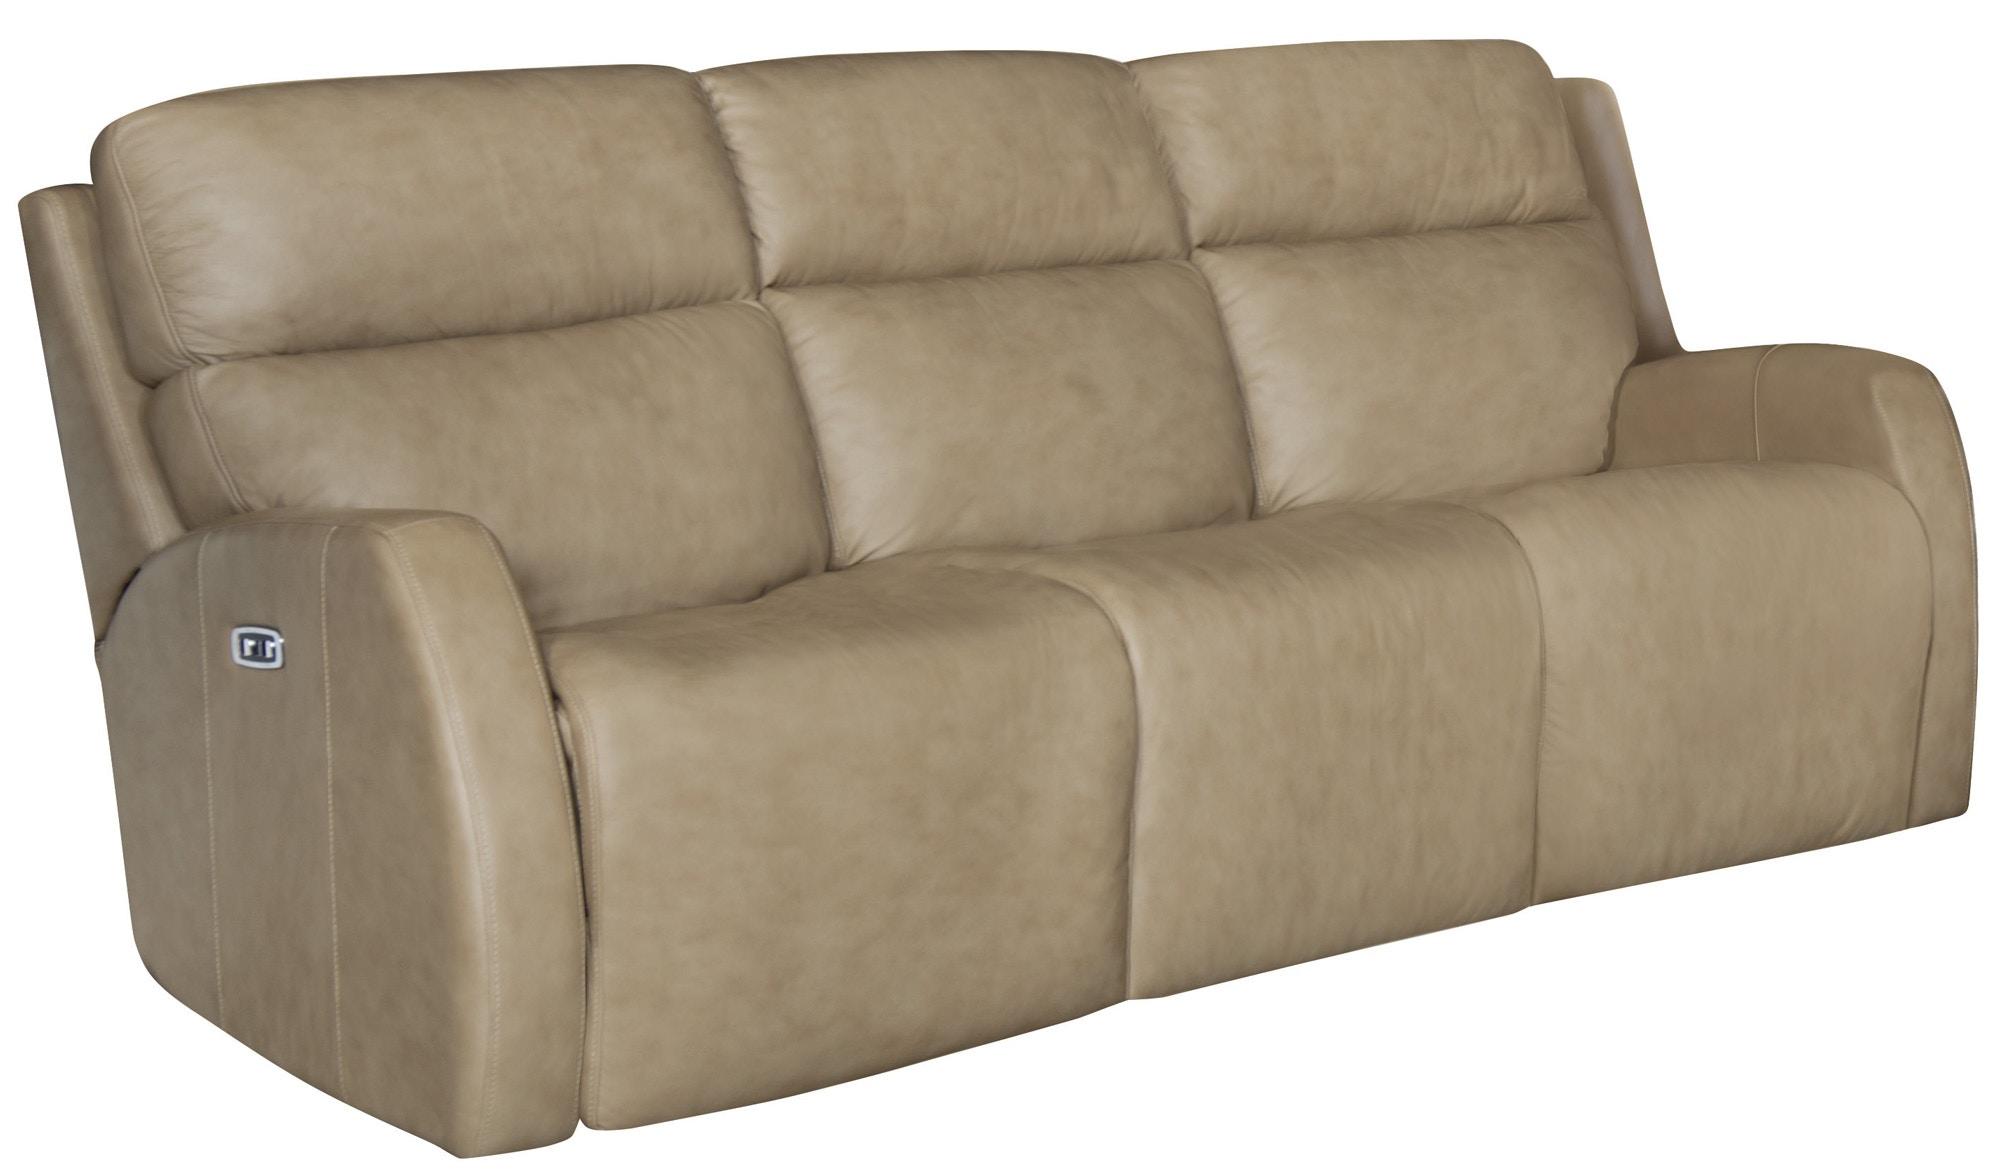 Bernhardt Furniture 897RL